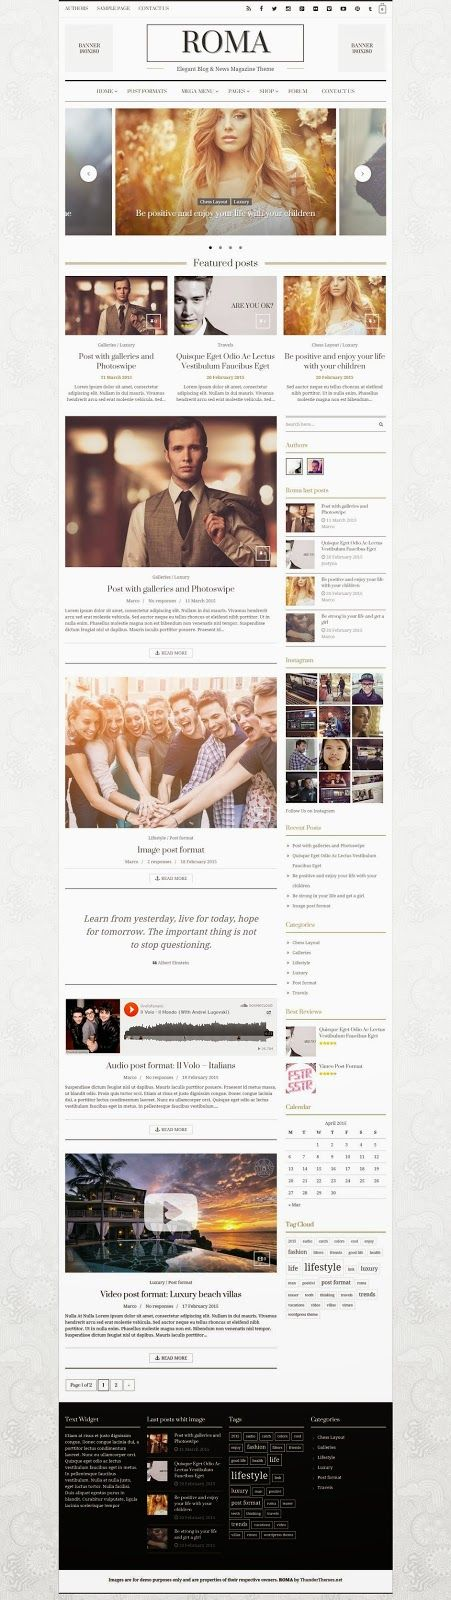 This is great!!! ROMA - Elegant Blog & News Magazine Theme